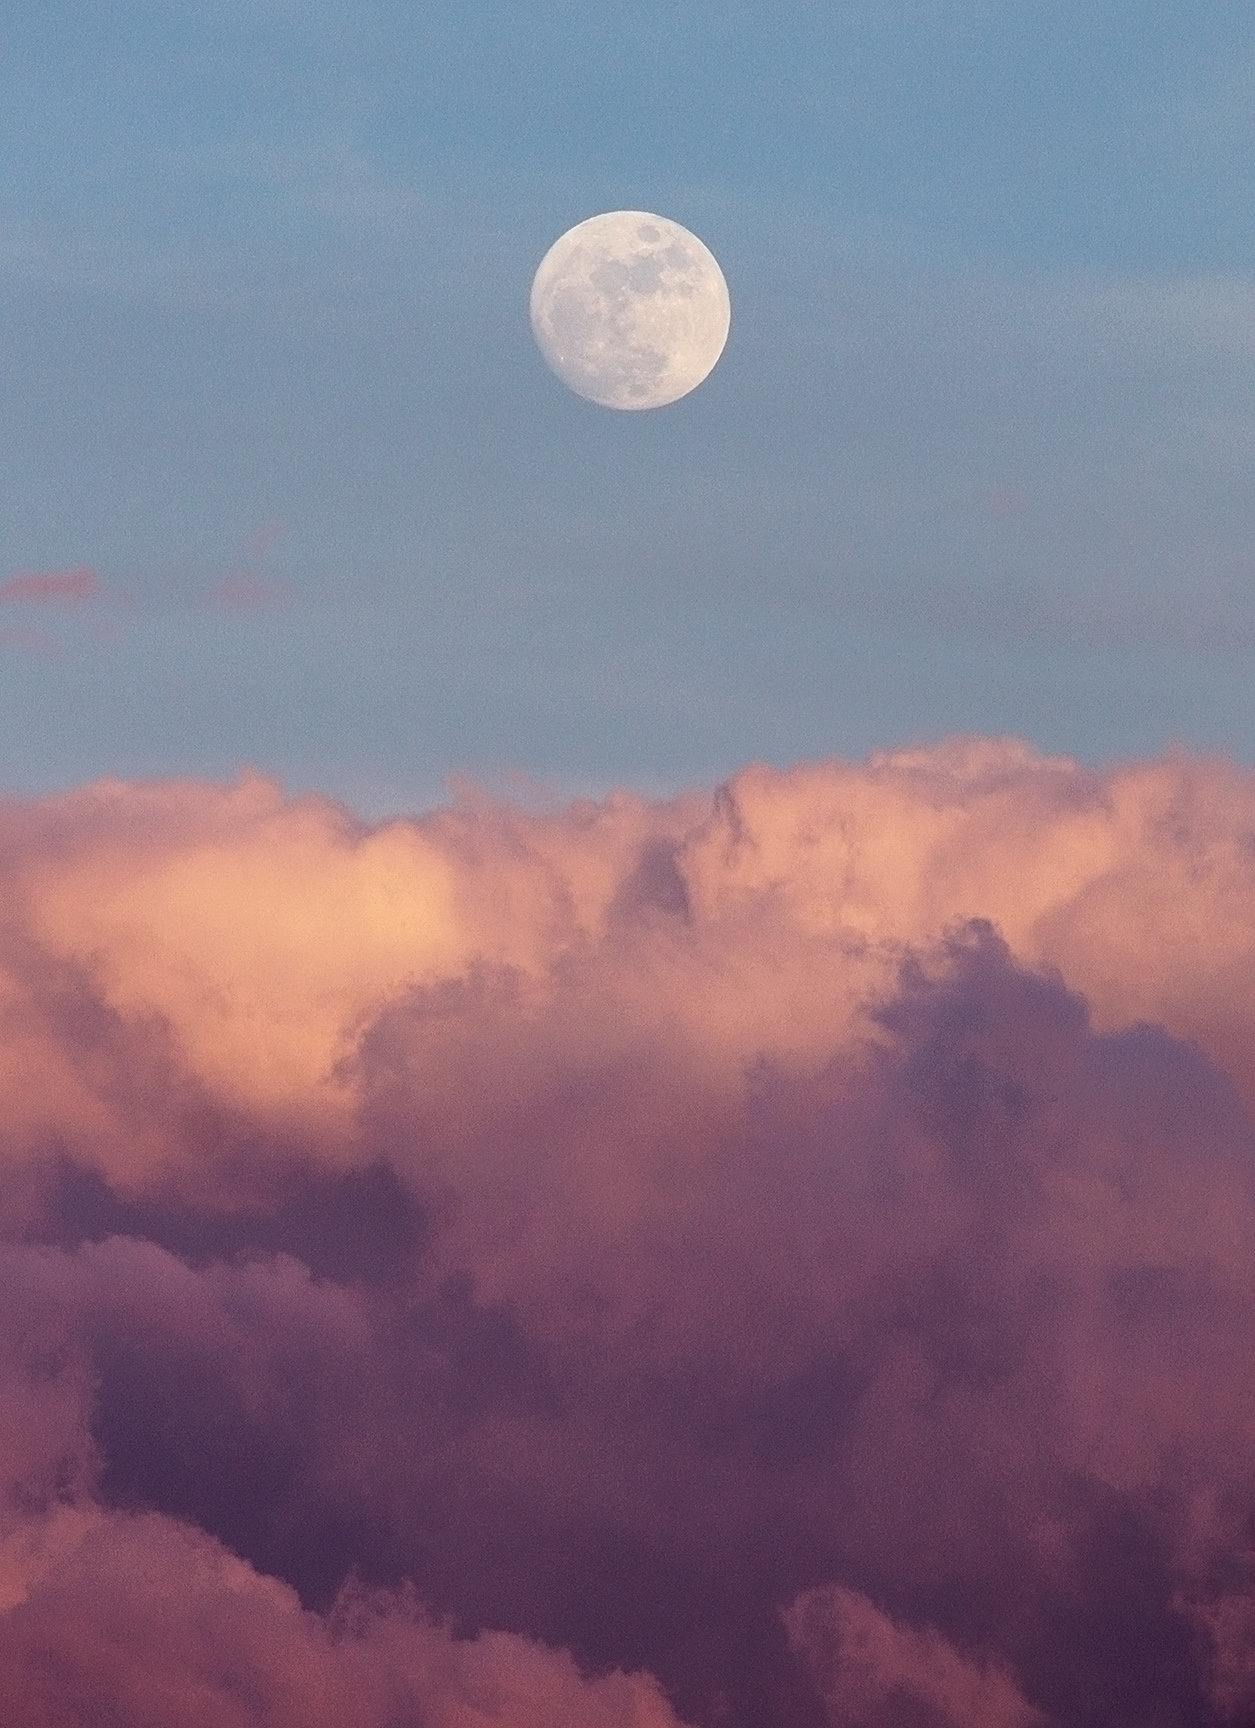 The Moon & the Sea - 003/365